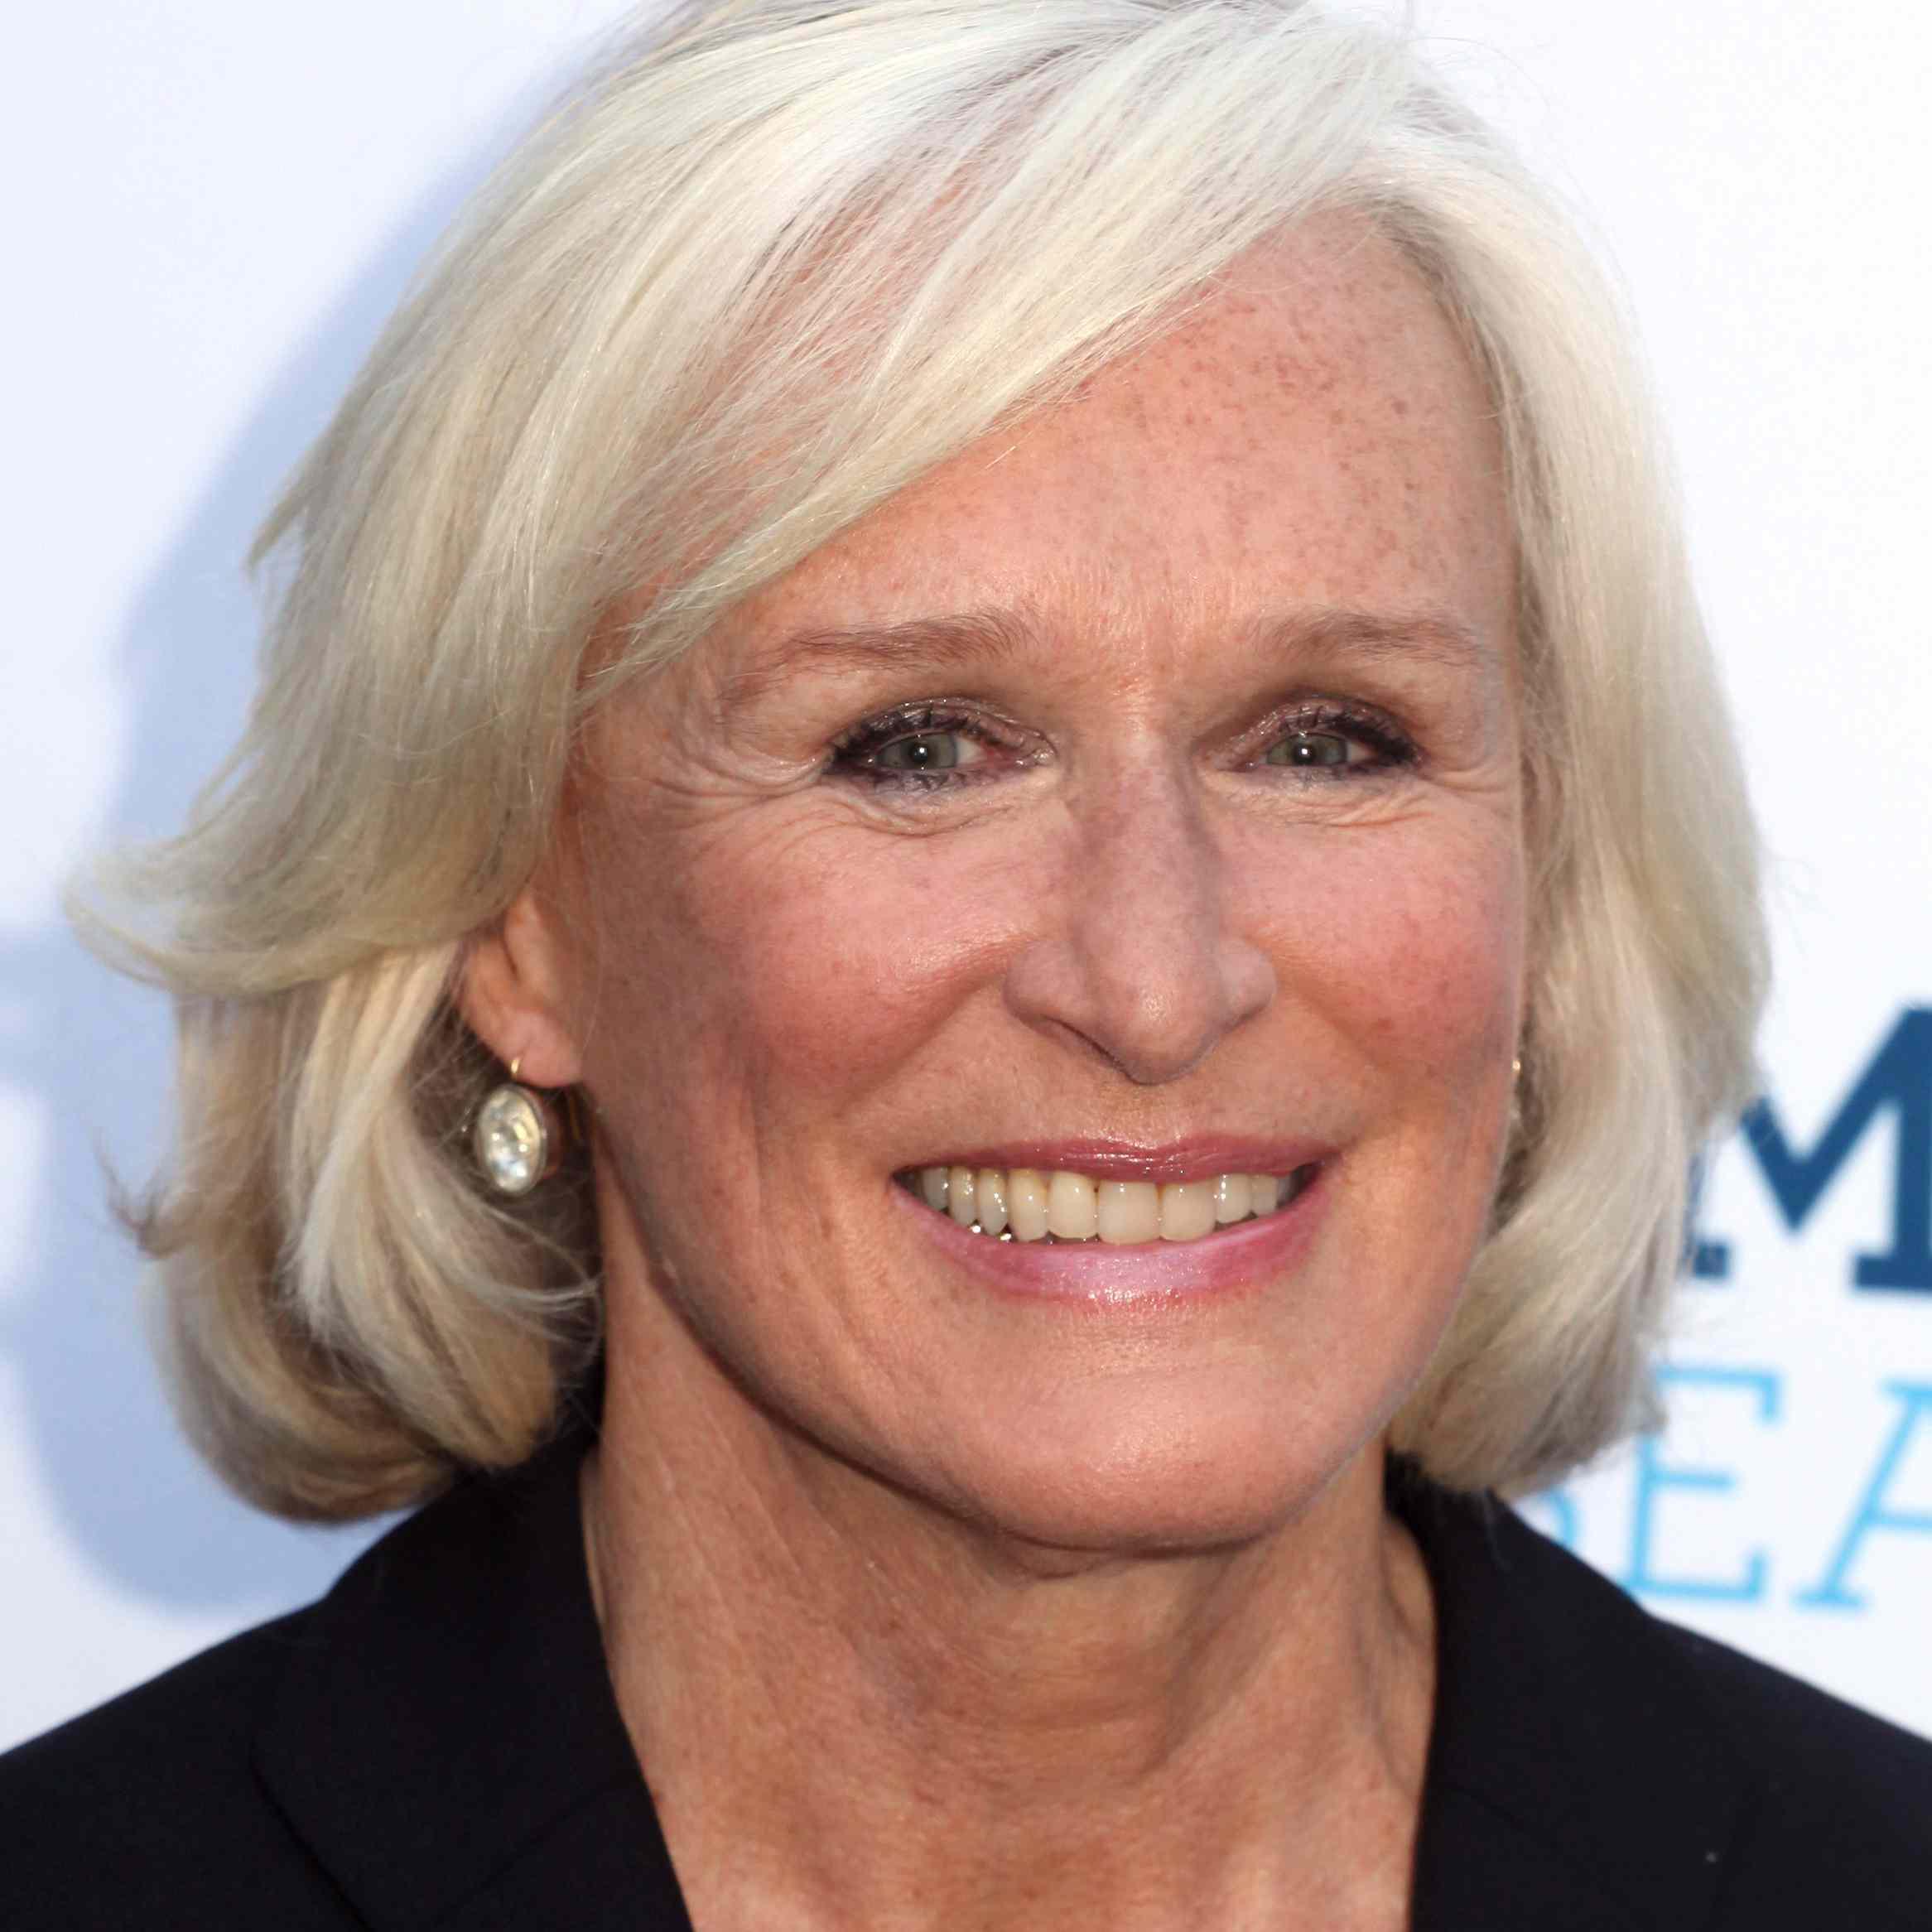 20 Flattering Bob Hairstyles On Older Women